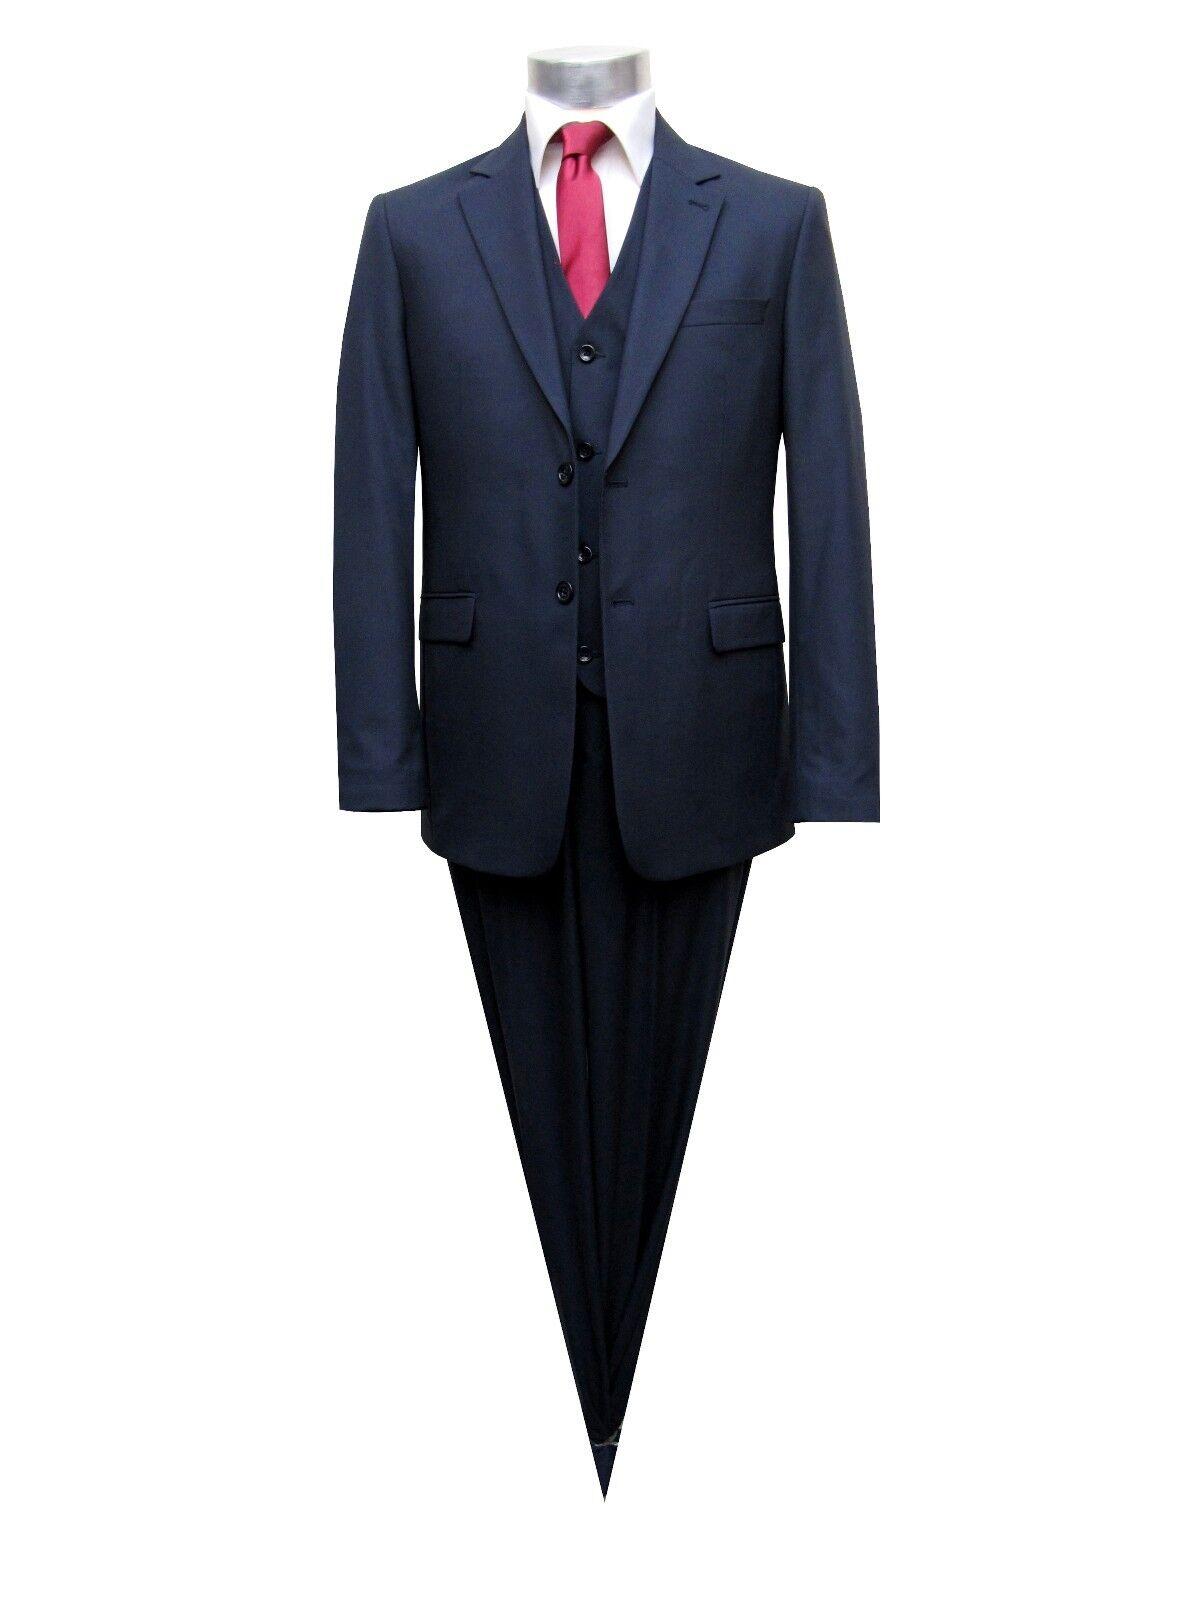 Herren Anzug 3-teilig Slim-fit Gr.56 Navyblau